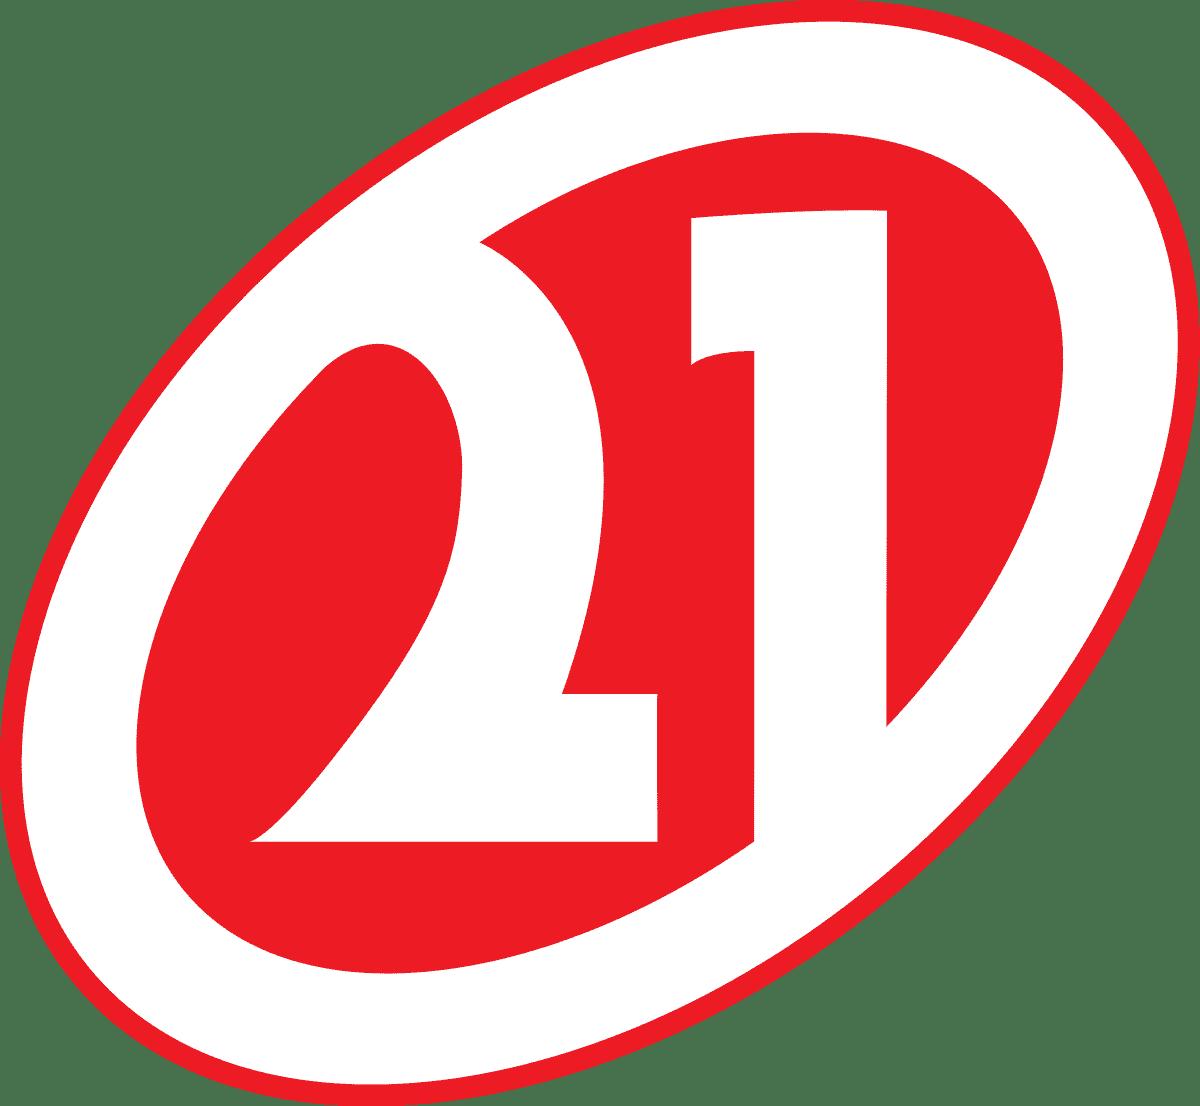 Rede 21